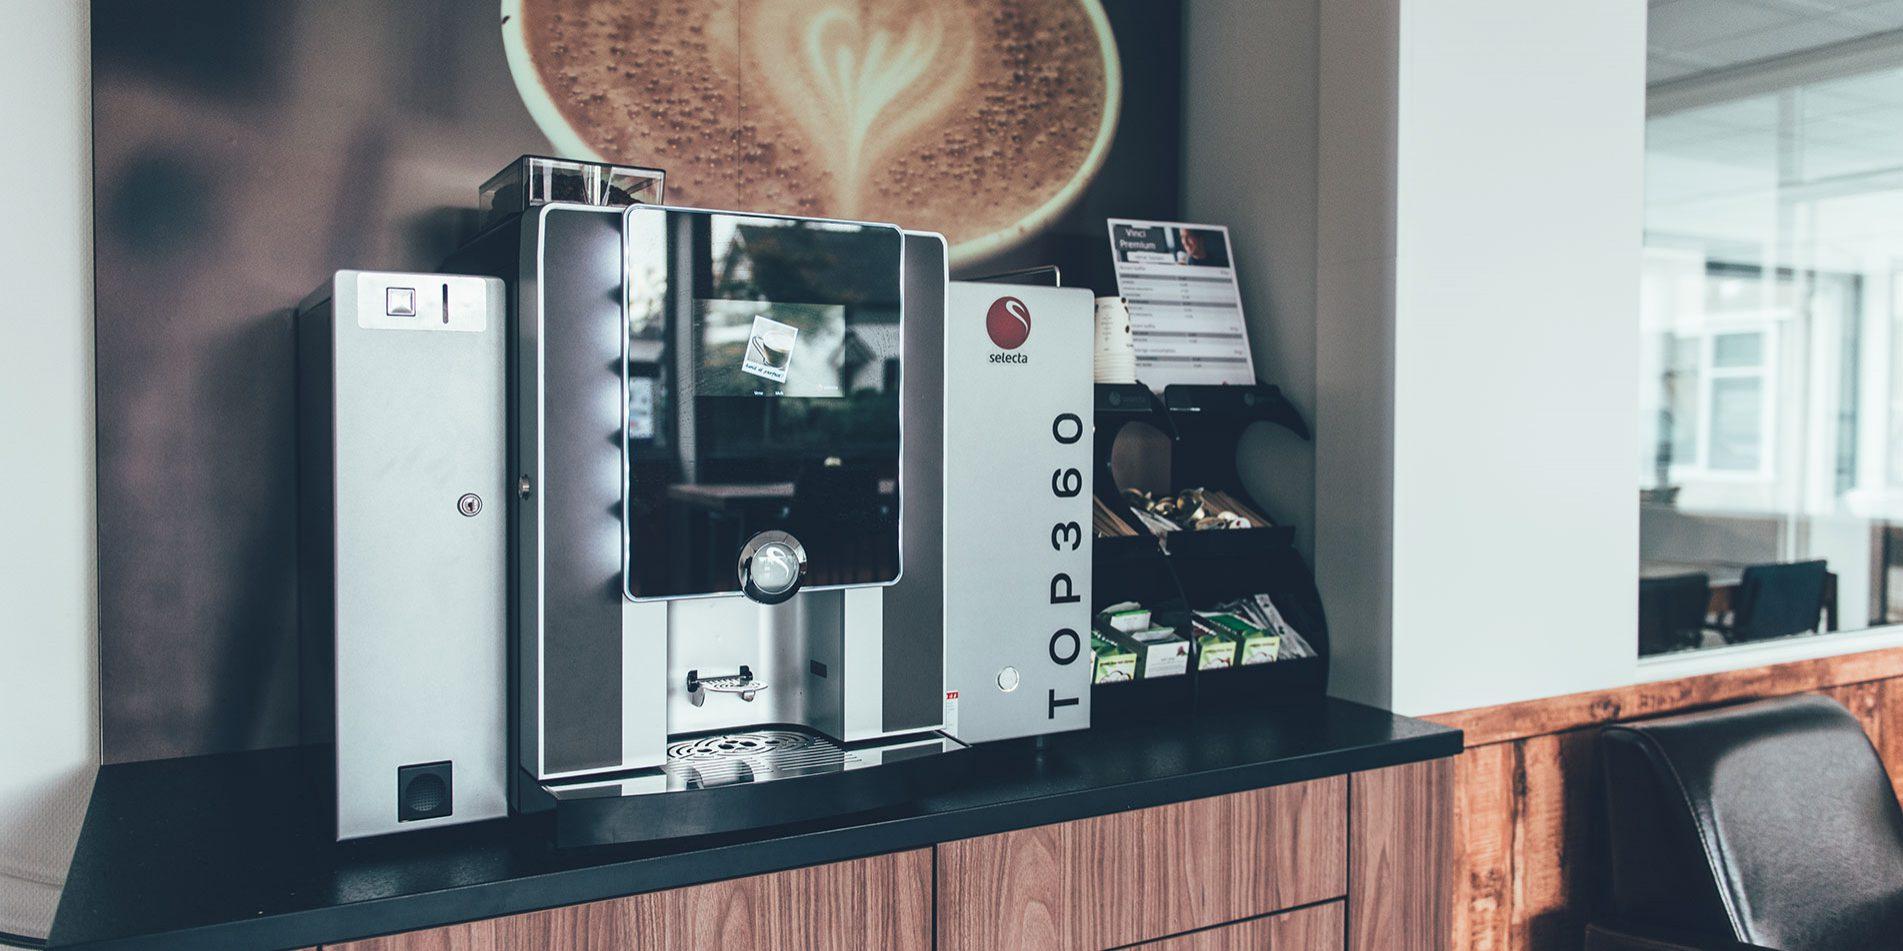 "<h2>Koffiecorner</h2> <p>Ontspan met heerlijke koffie</p> <a href=""/koffie"">Ga snel kijken!</a>"